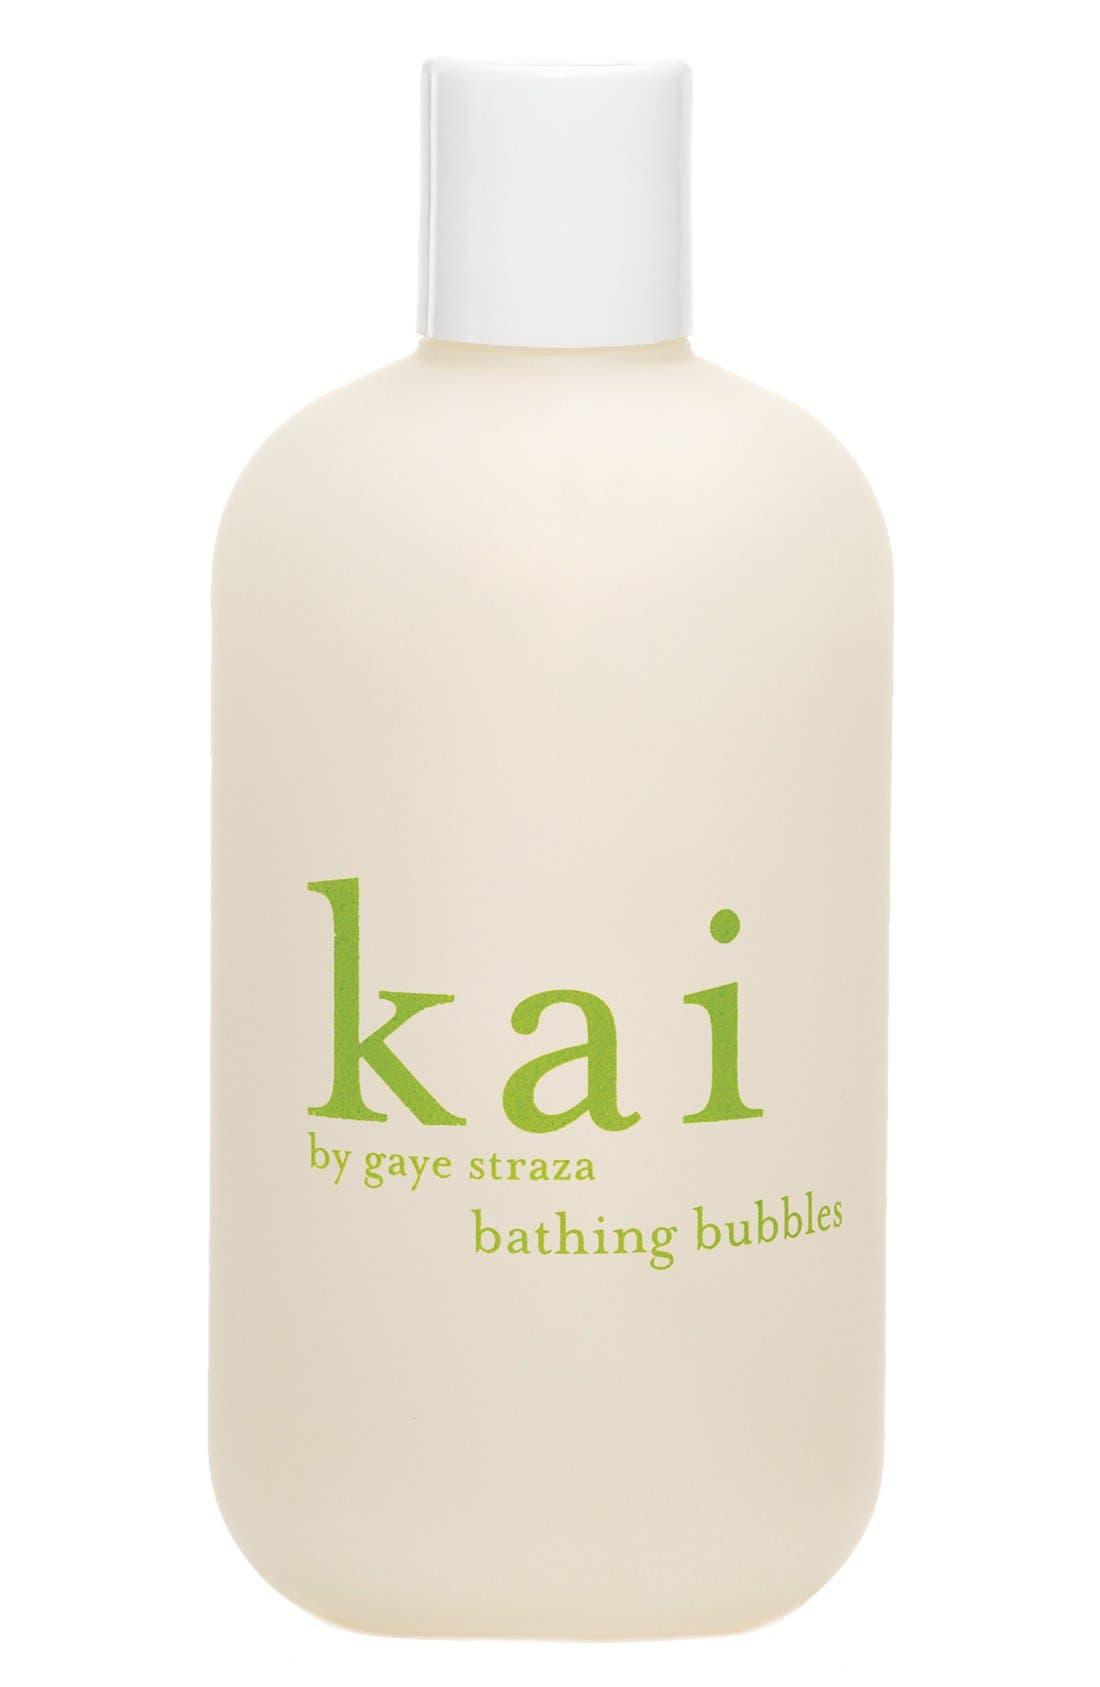 kai Bathing Bubbles